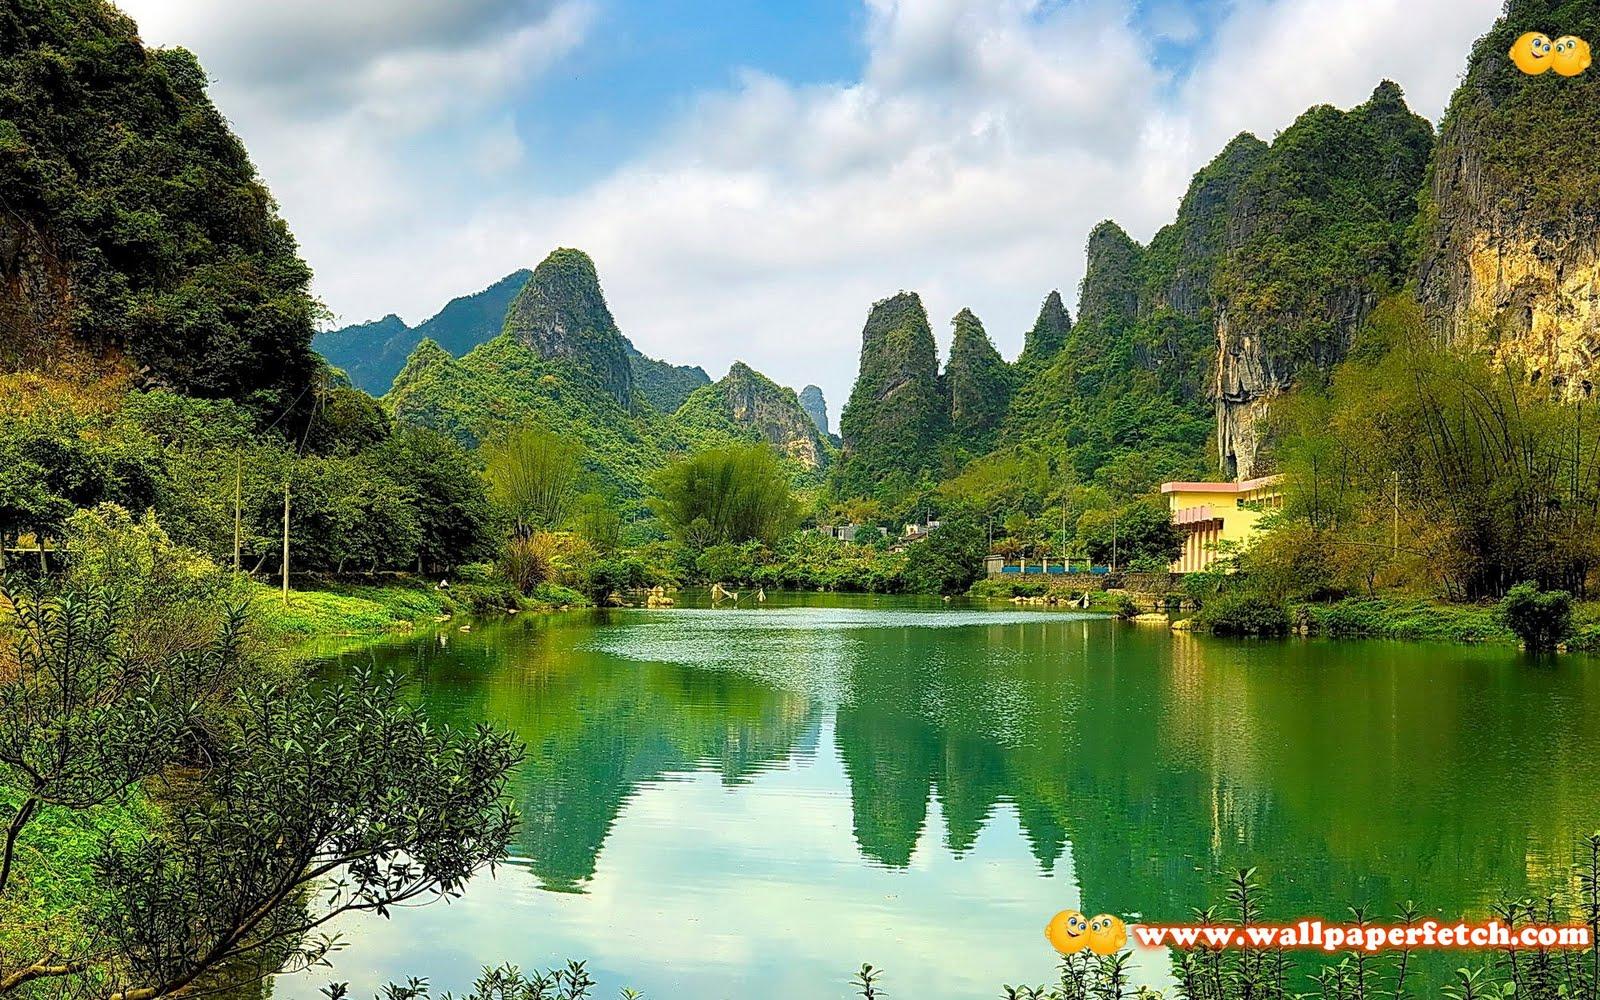 http://1.bp.blogspot.com/-0YAcd57Kixk/Tr20E_vCCdI/AAAAAAAAKX4/xq3I8unusJ4/s1600/SuperPack_Beautiful_Nature_HD_Wallpapers_Part__80.117.jpg